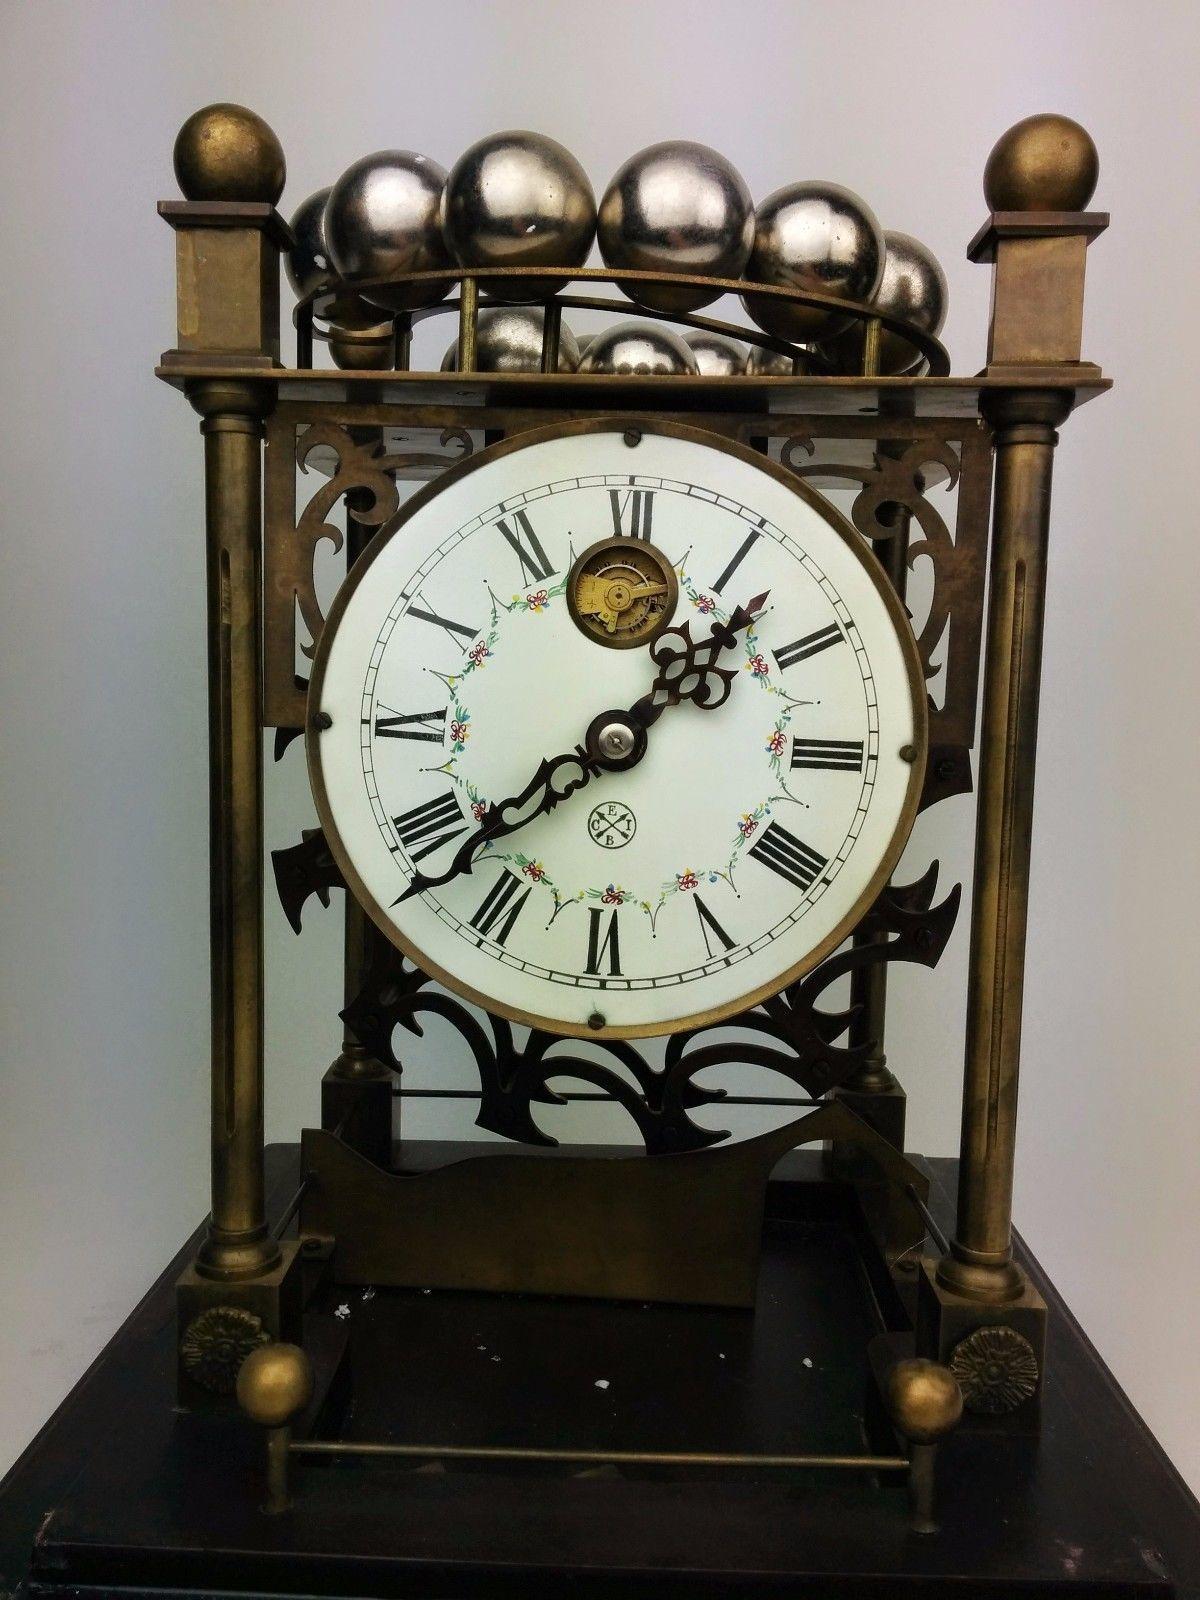 Rare Falling Ball Bearing Ferris Wheel Antique Style Mantle Shelf Or Desk Clock Marble Ball Clock Diy Clock